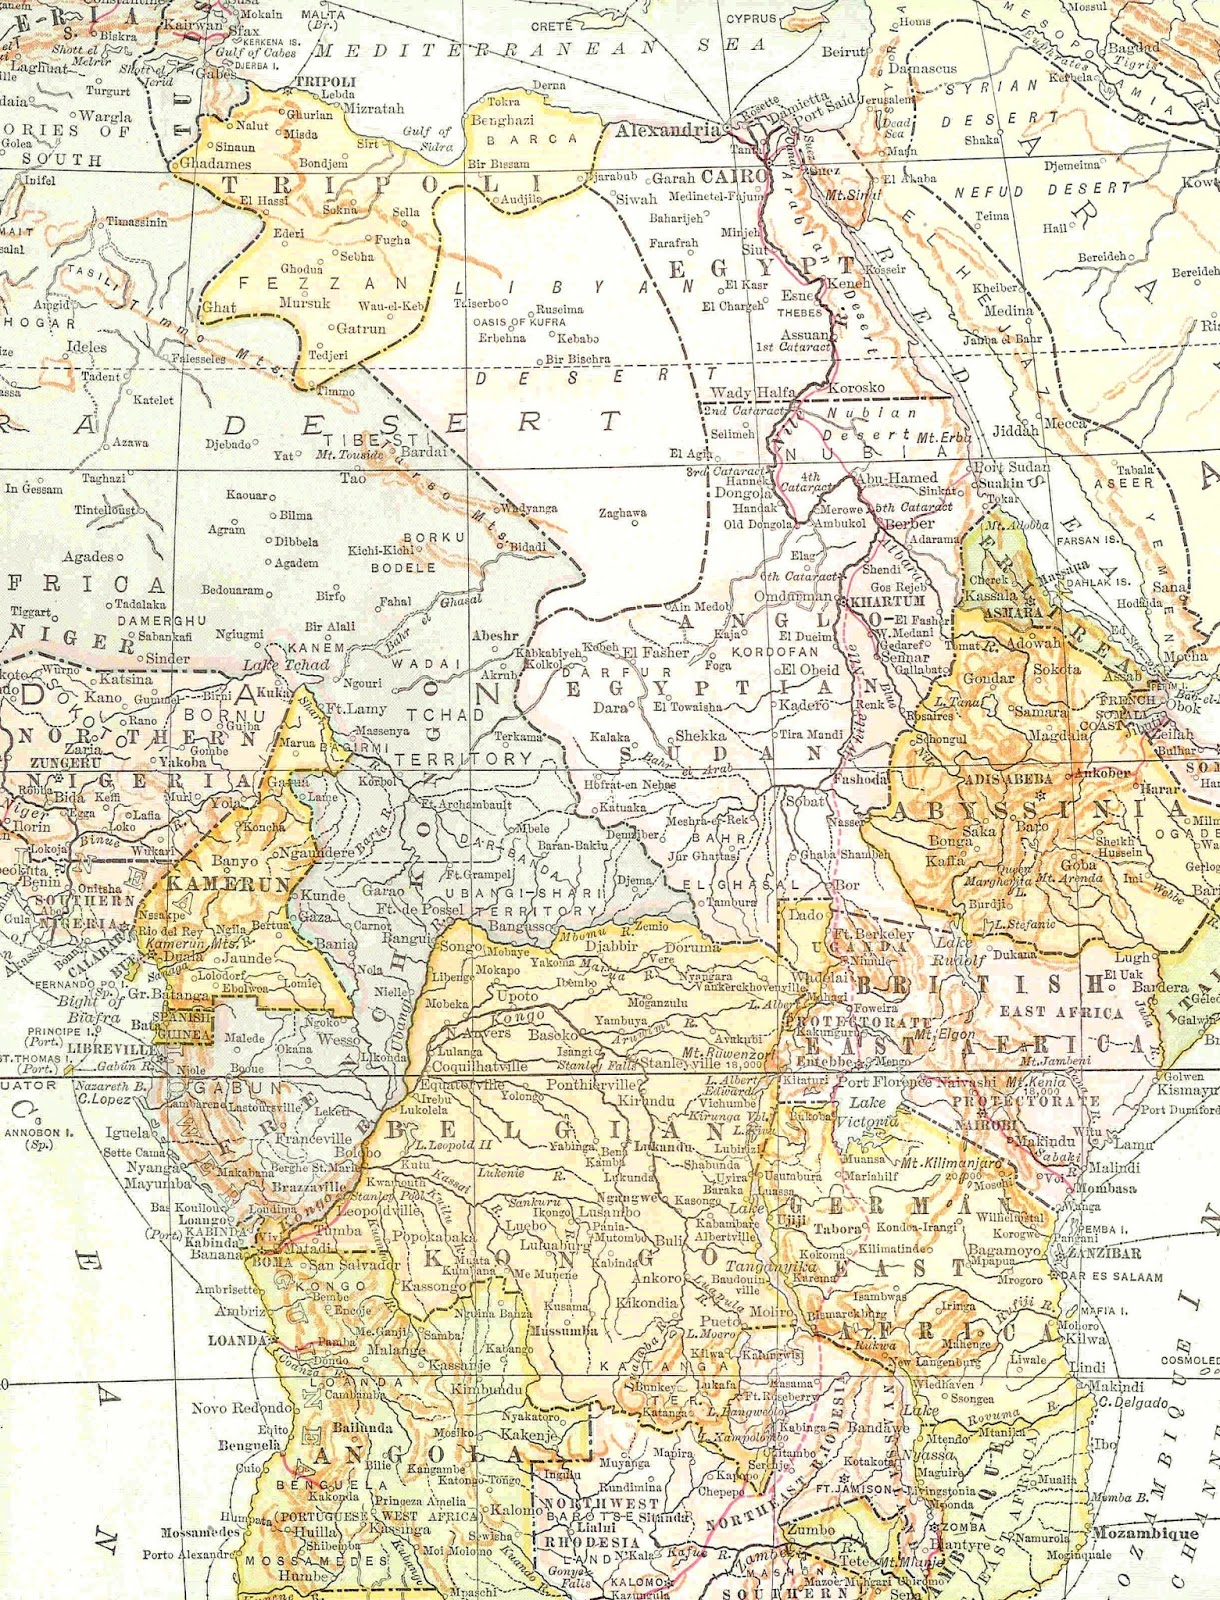 Digital Map Background Vintage Map of Africa Printable 1220x1600